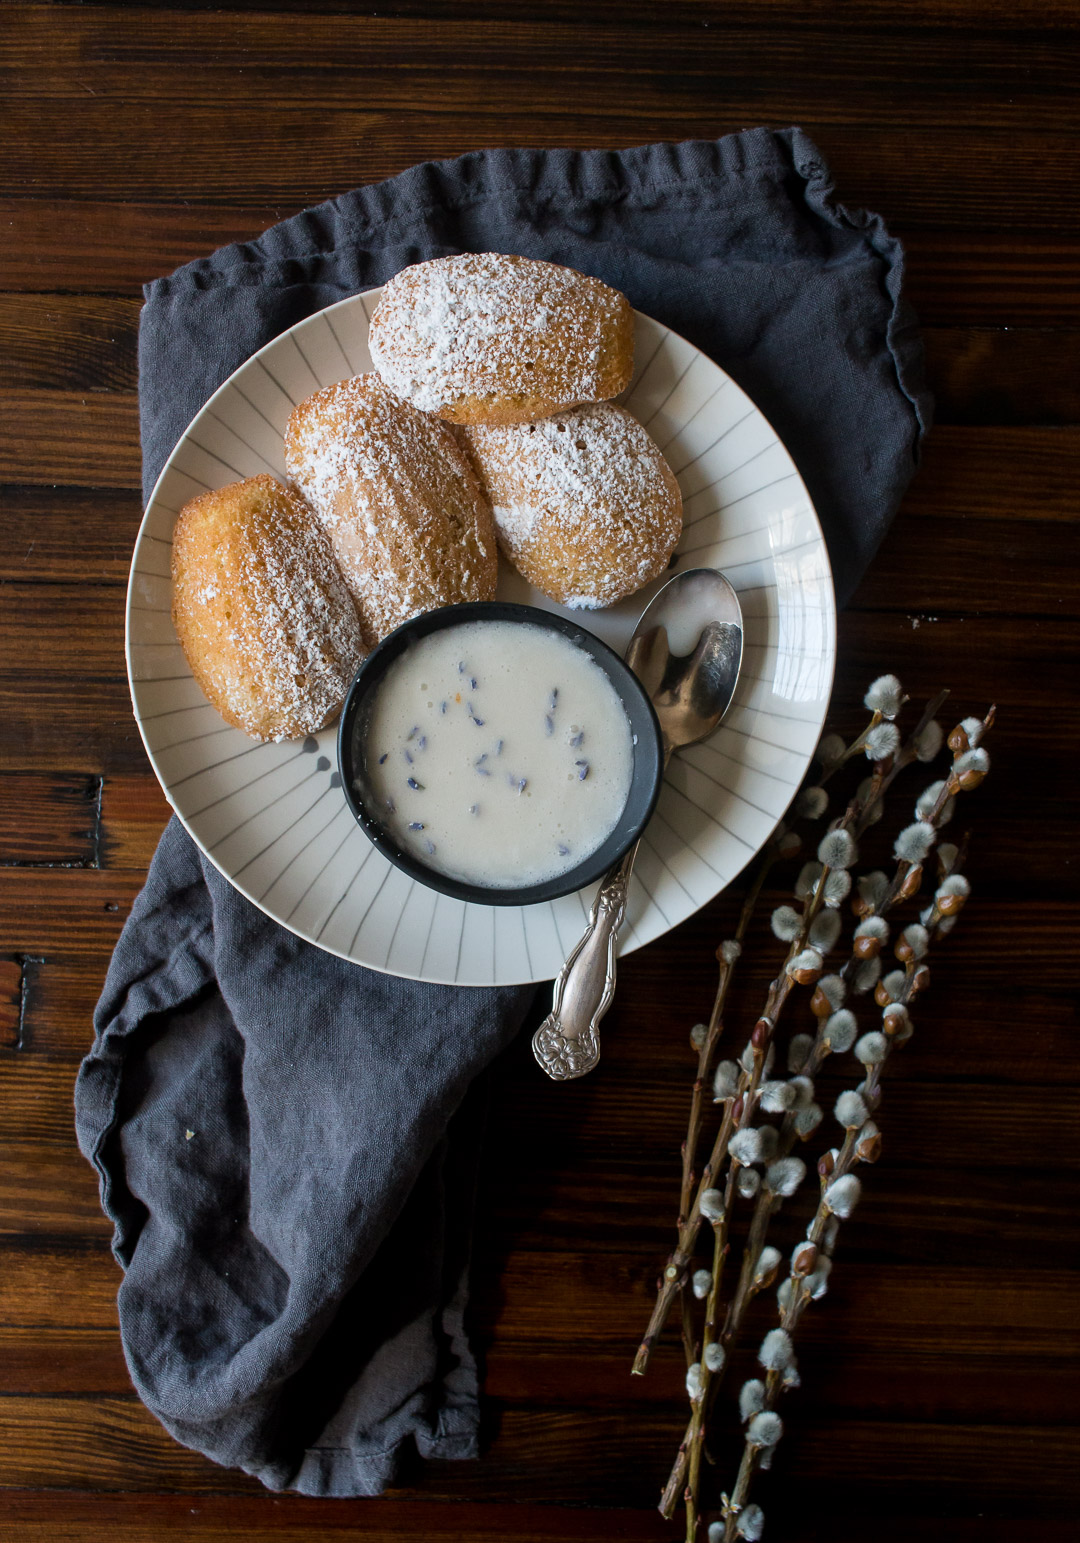 Lemon Spelt Flour Madeleines with Warm Lavender Glaze